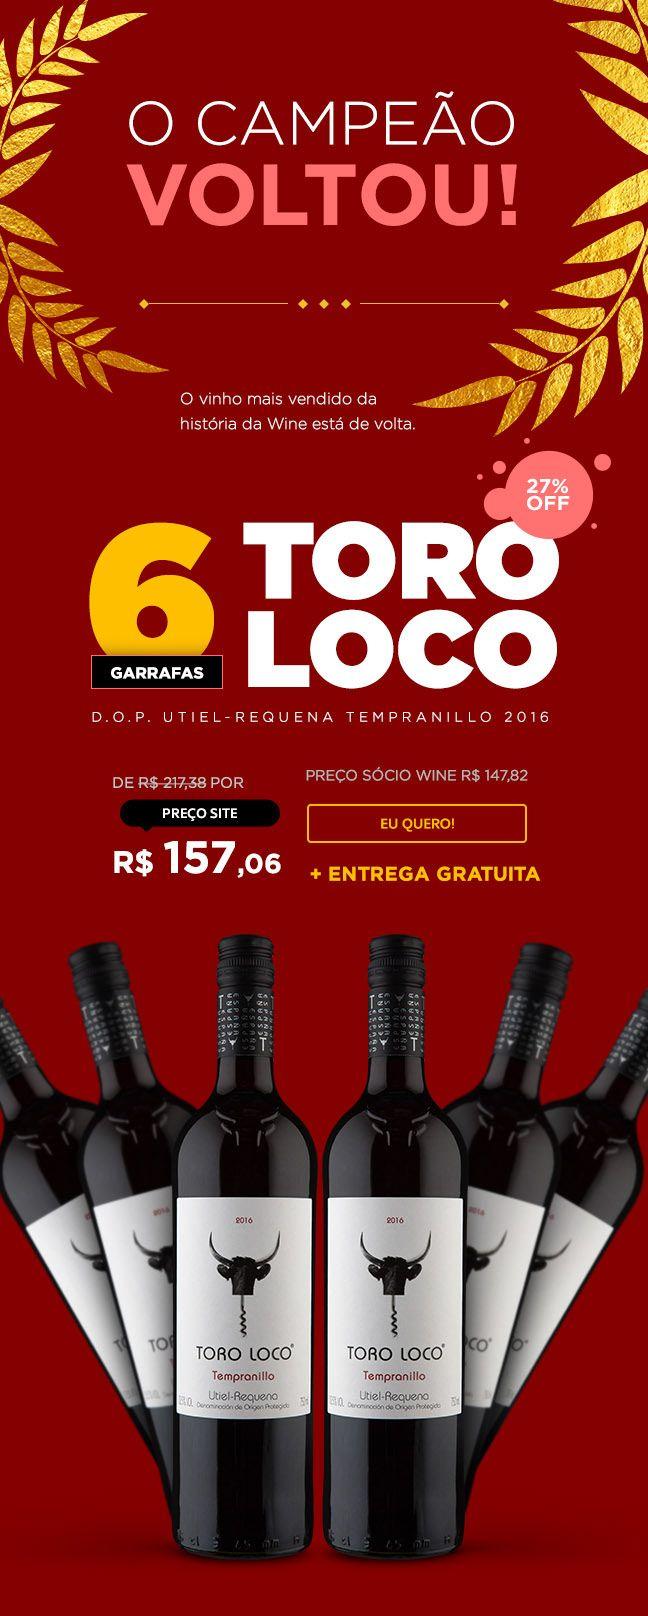 Newsletter Toro Loco Wine Com Br On Behance Tempranillo Newsletters Wine